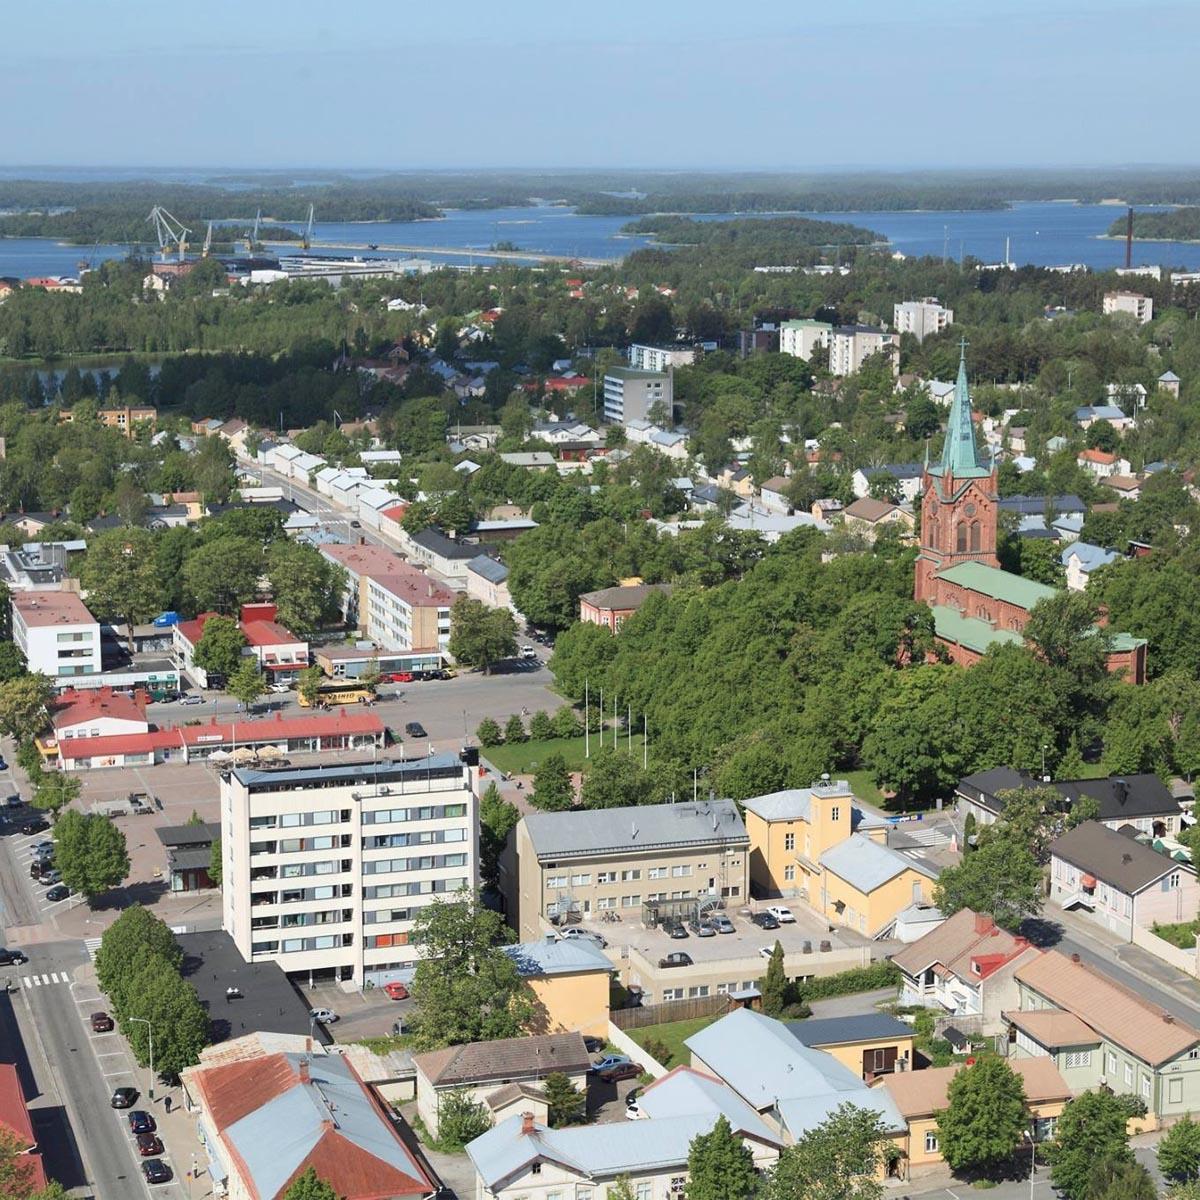 http://www.crusellasunnot.fi/wp-content/uploads/2016/05/tietoa_kaupungista.jpg